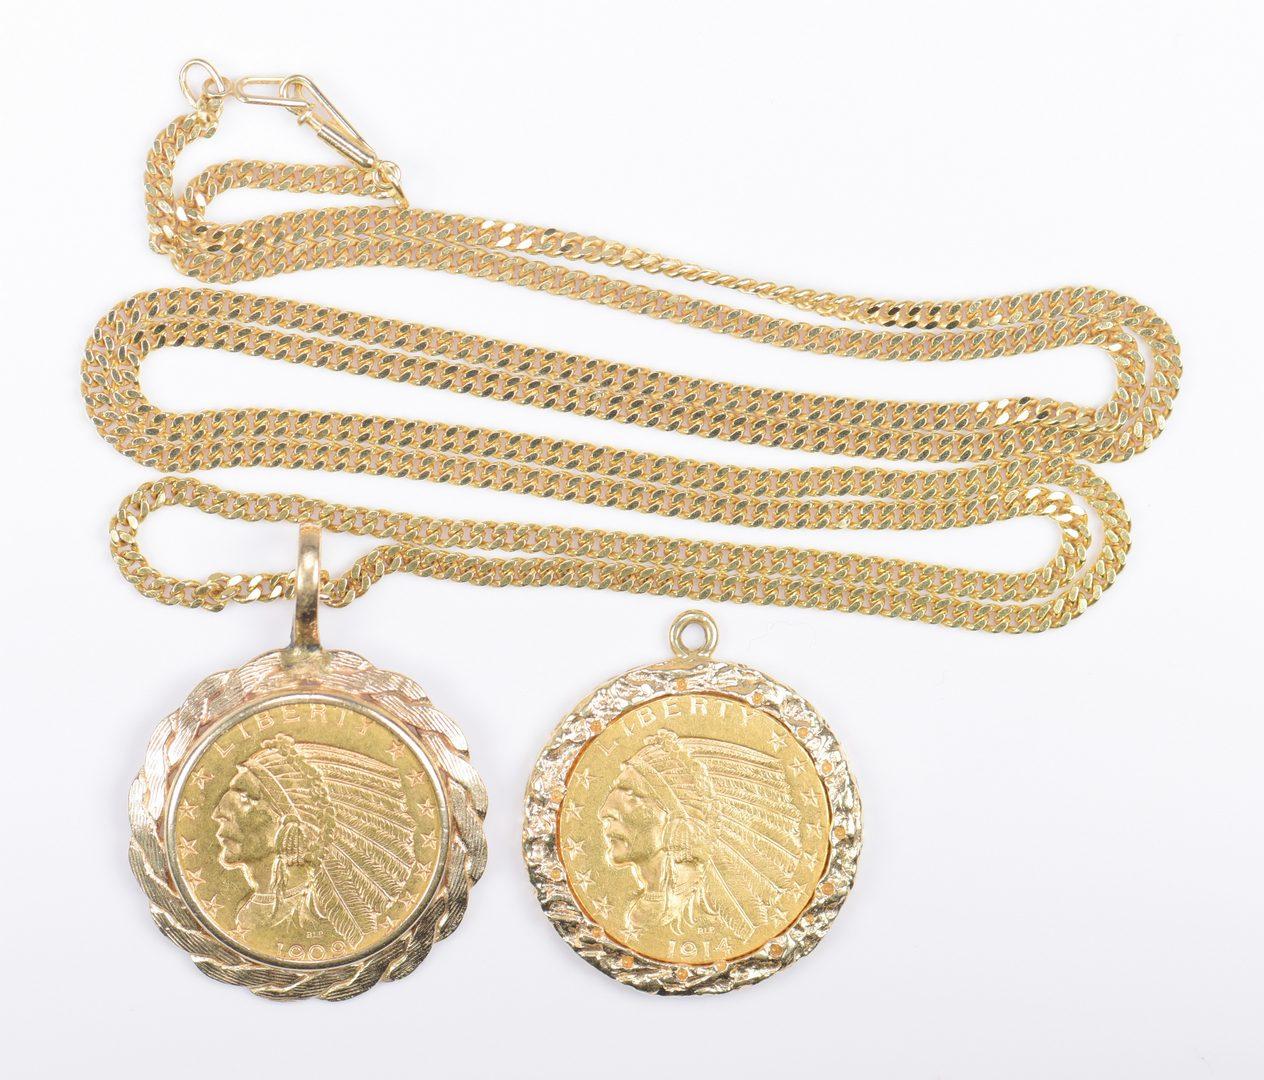 Lot 976: 2 Vintage American Coin Pendants; 18K chain